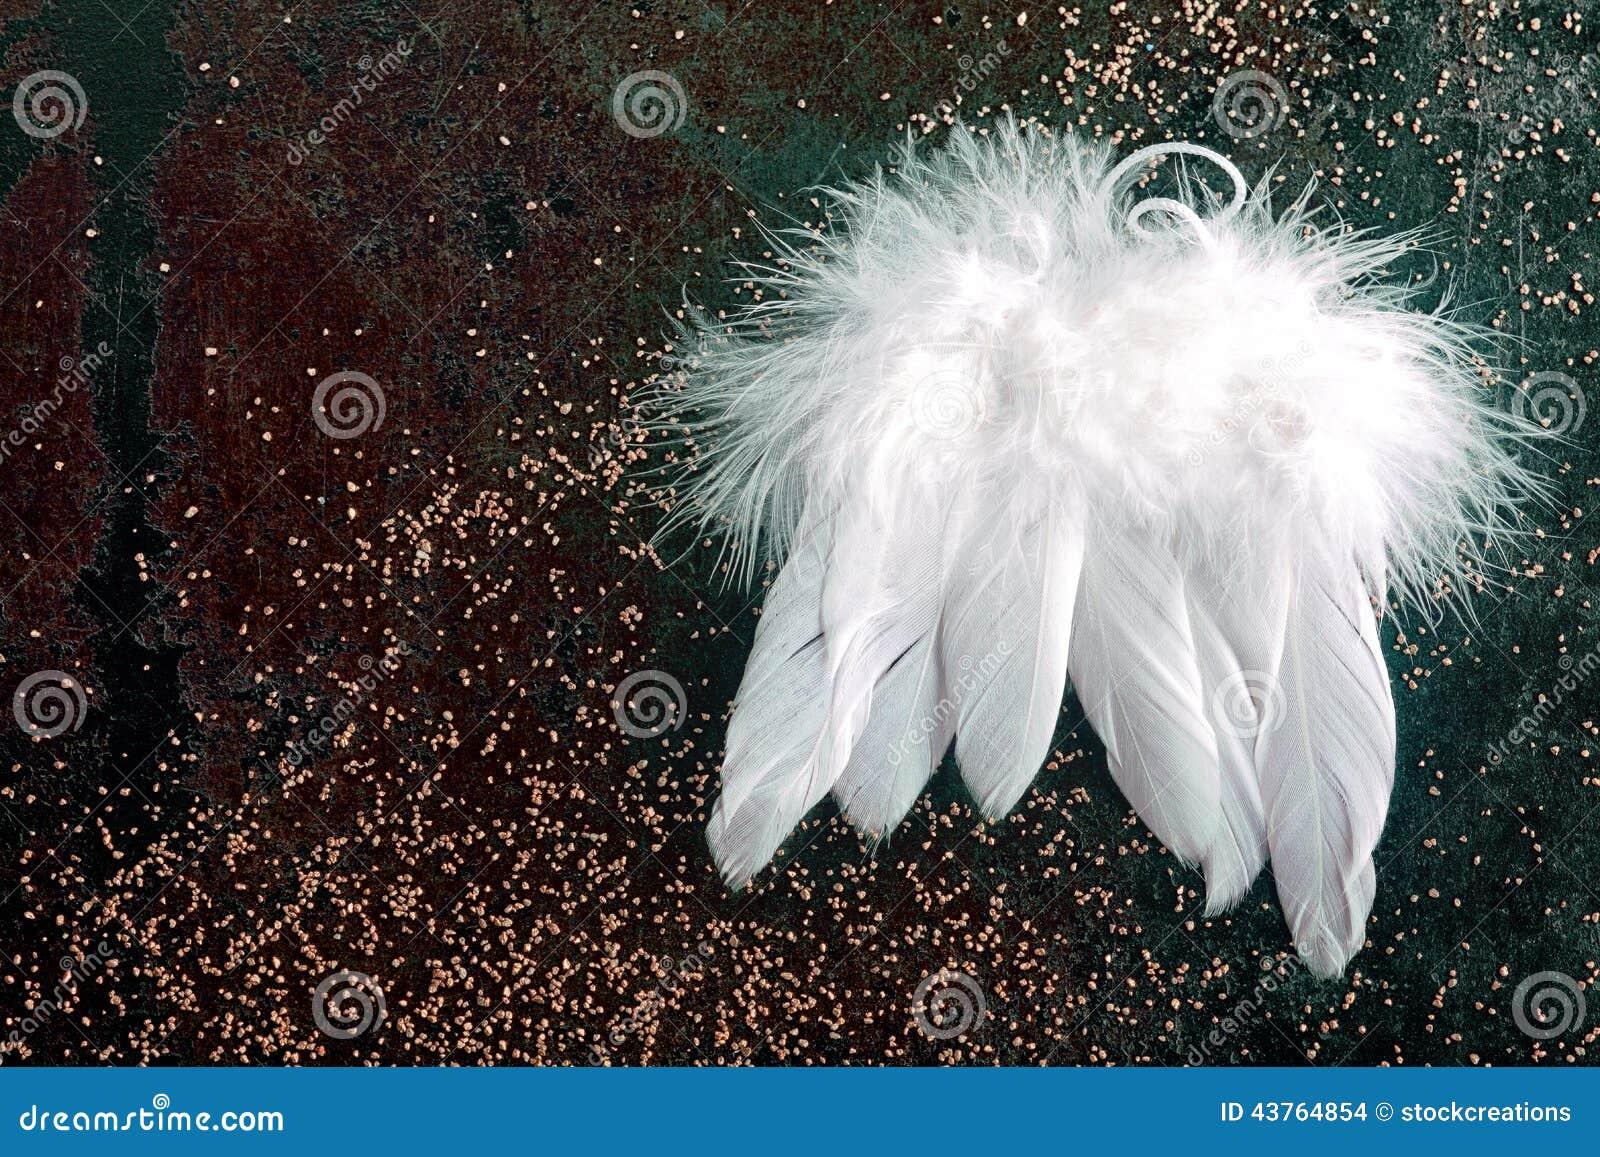 Light Up Christmas Angel